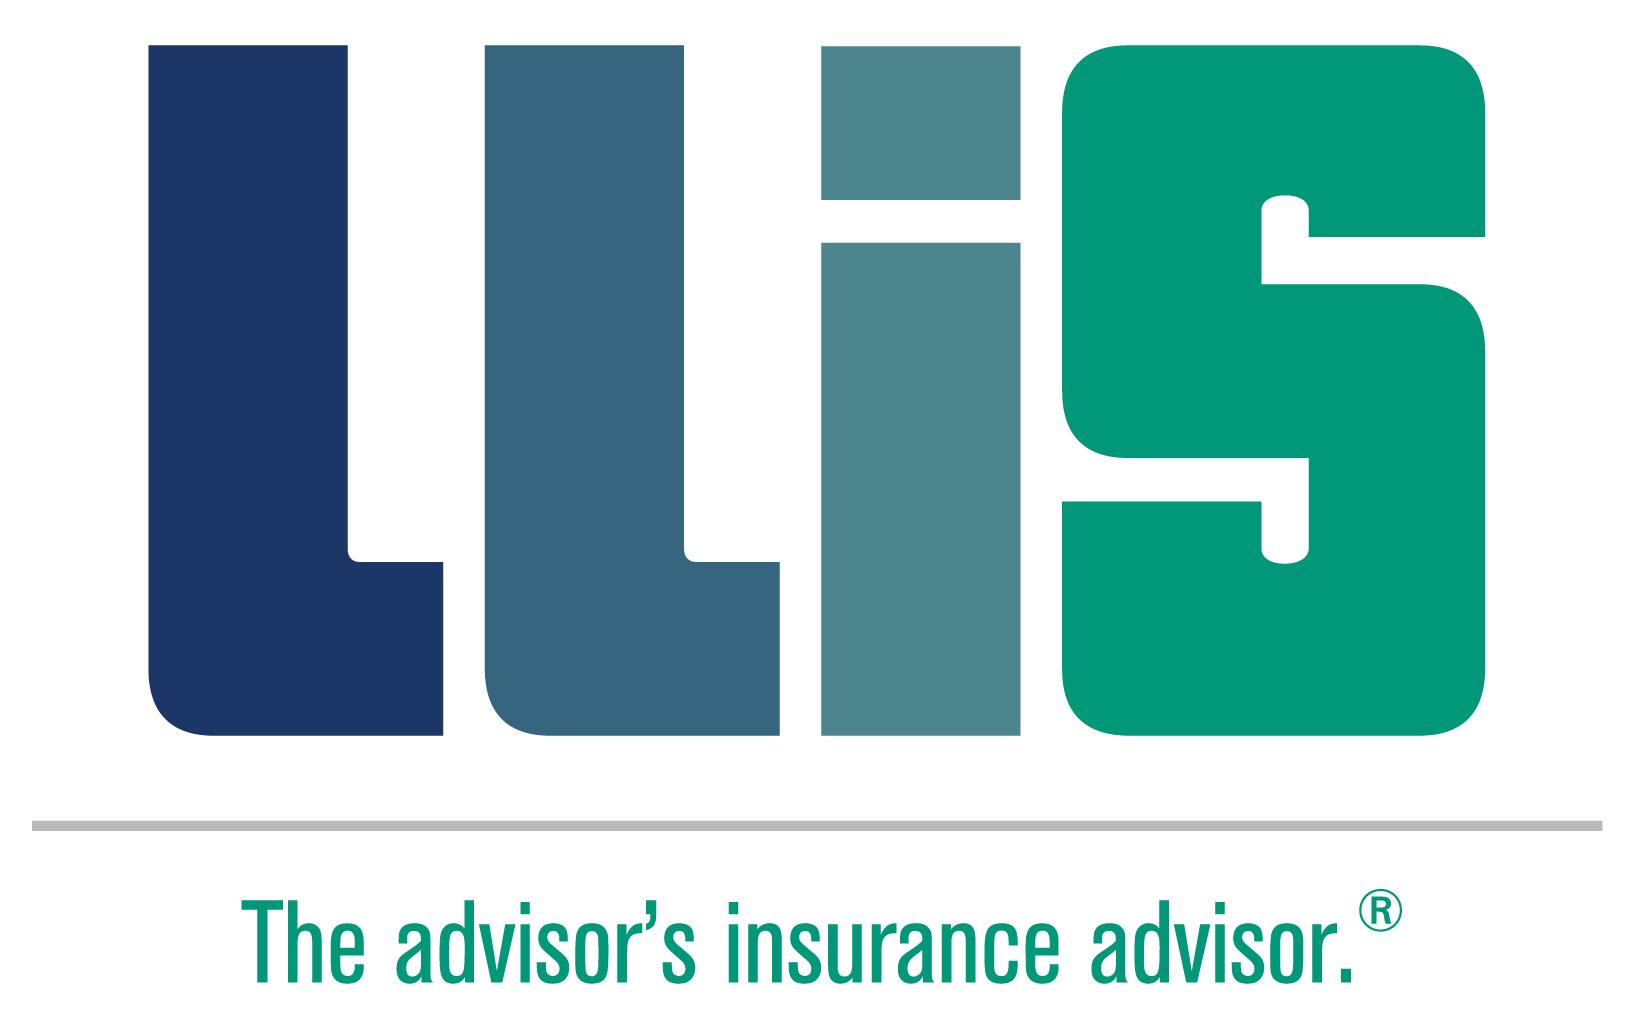 Tiaa Cref Life Insurance Quote Presentations  2016 Conference